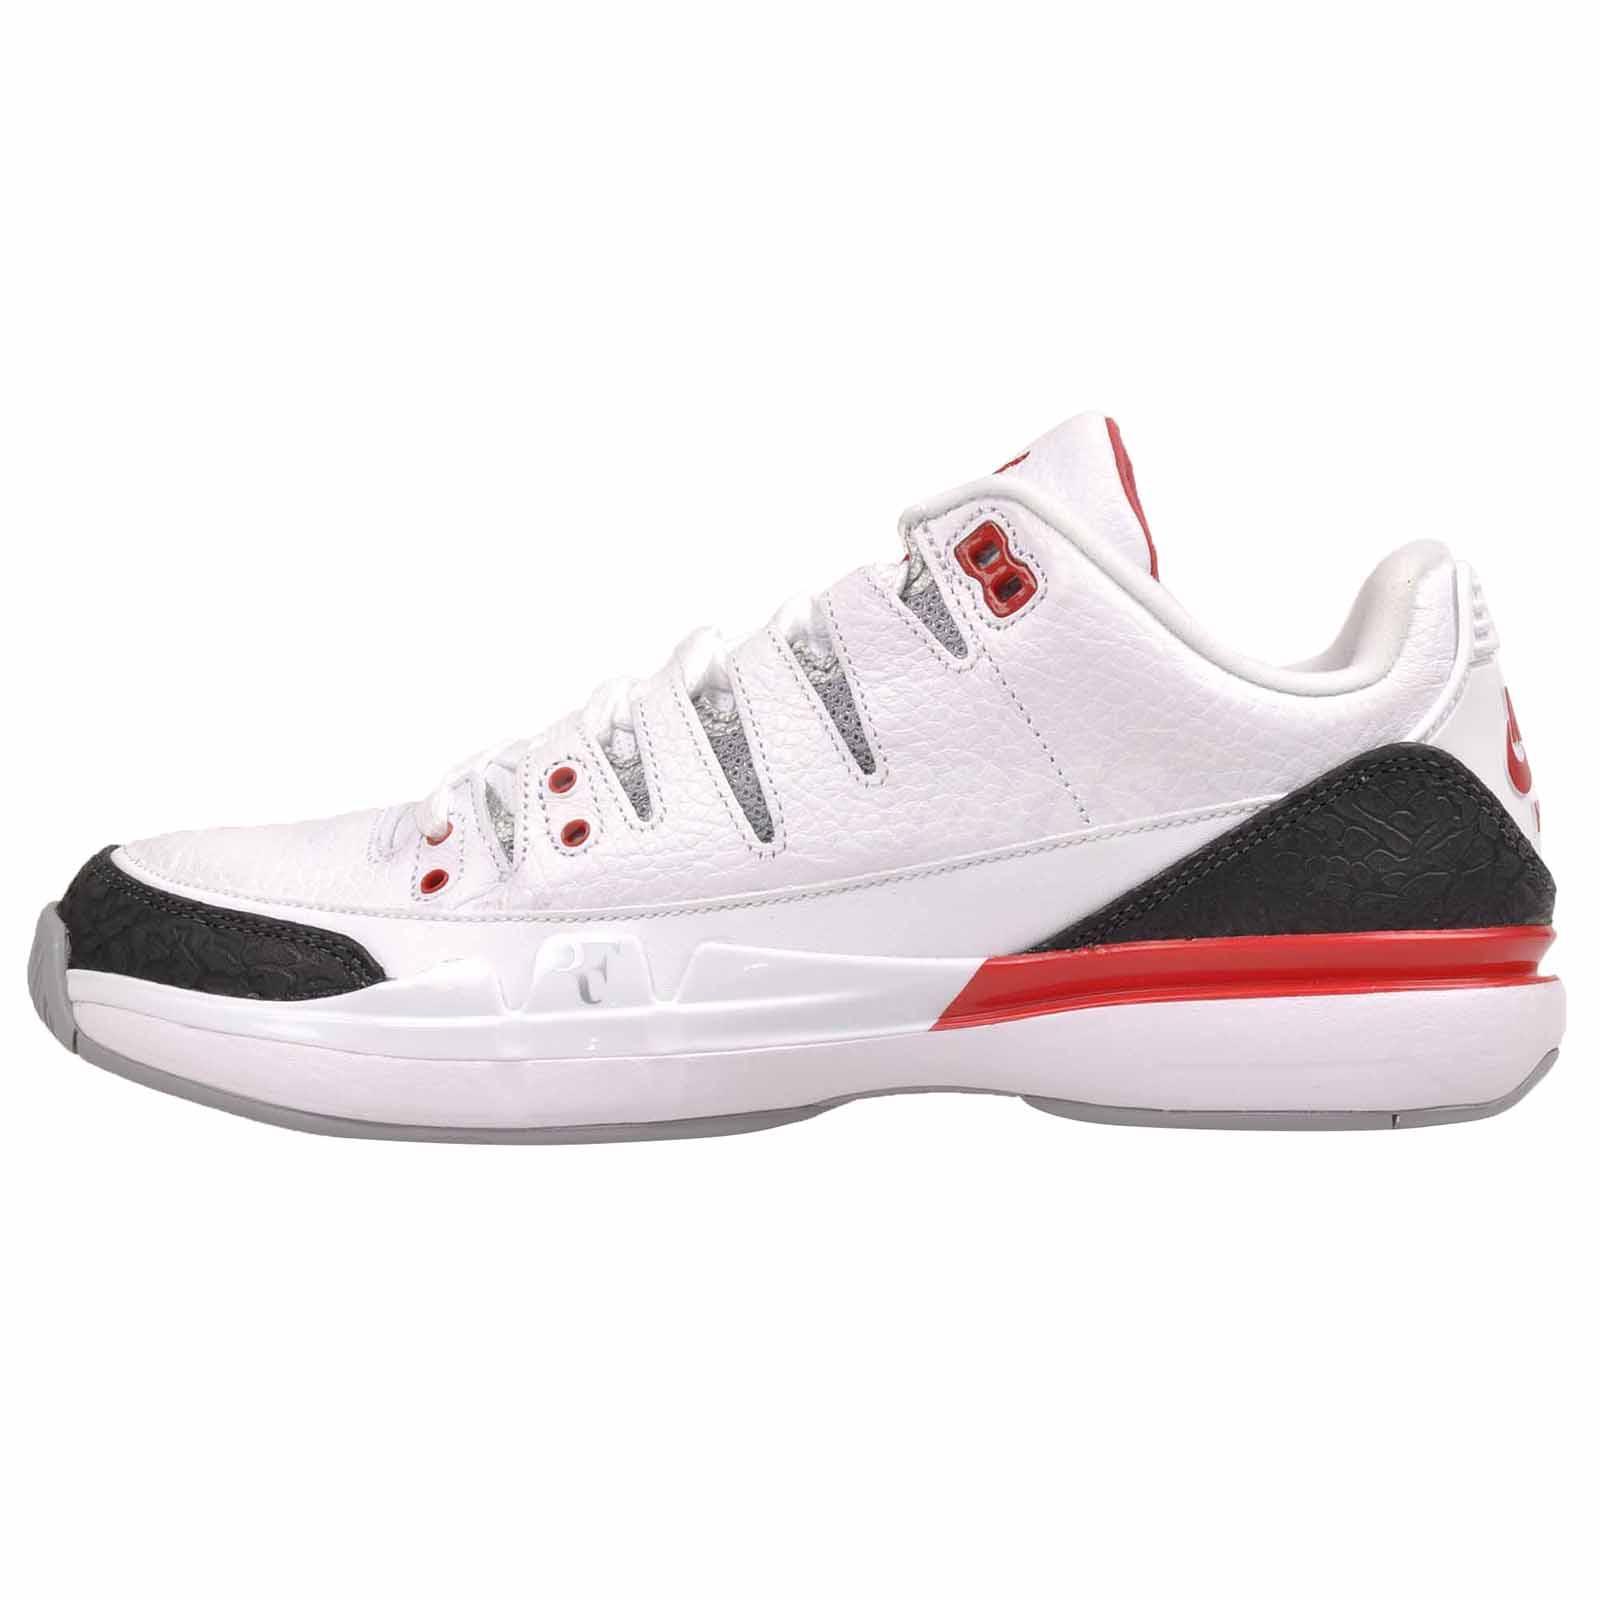 20a406a00890 Details about Nike Zoom Vapor RF X AJ3 Federer x Jordan Mens Tennis White  (No Lid) 709998-106